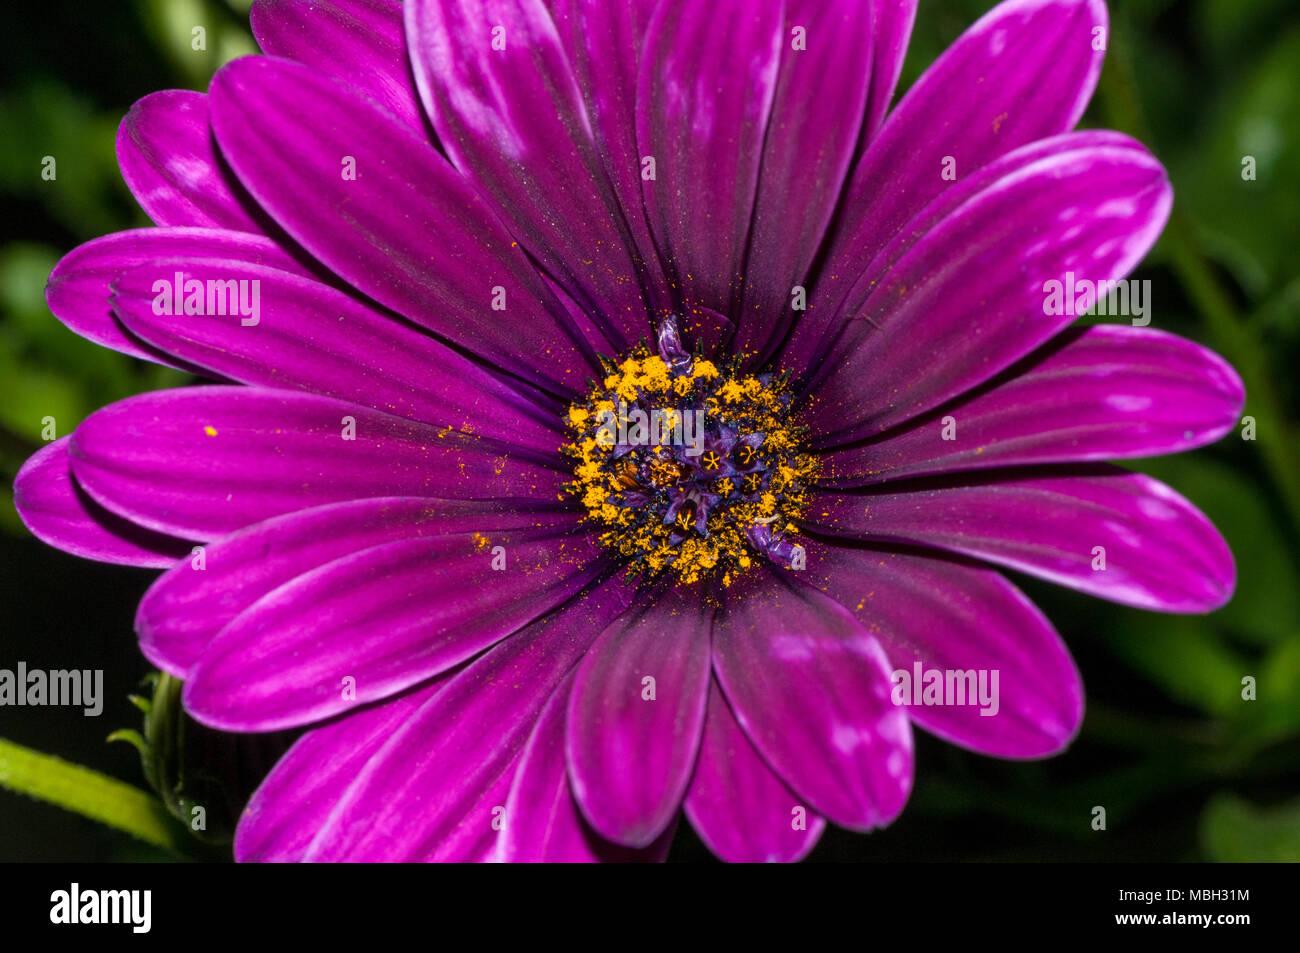 Sundays river daisy, Van Staden's river daisy, white daisy bush, Dimorphoteca ecklonis - Stock Image